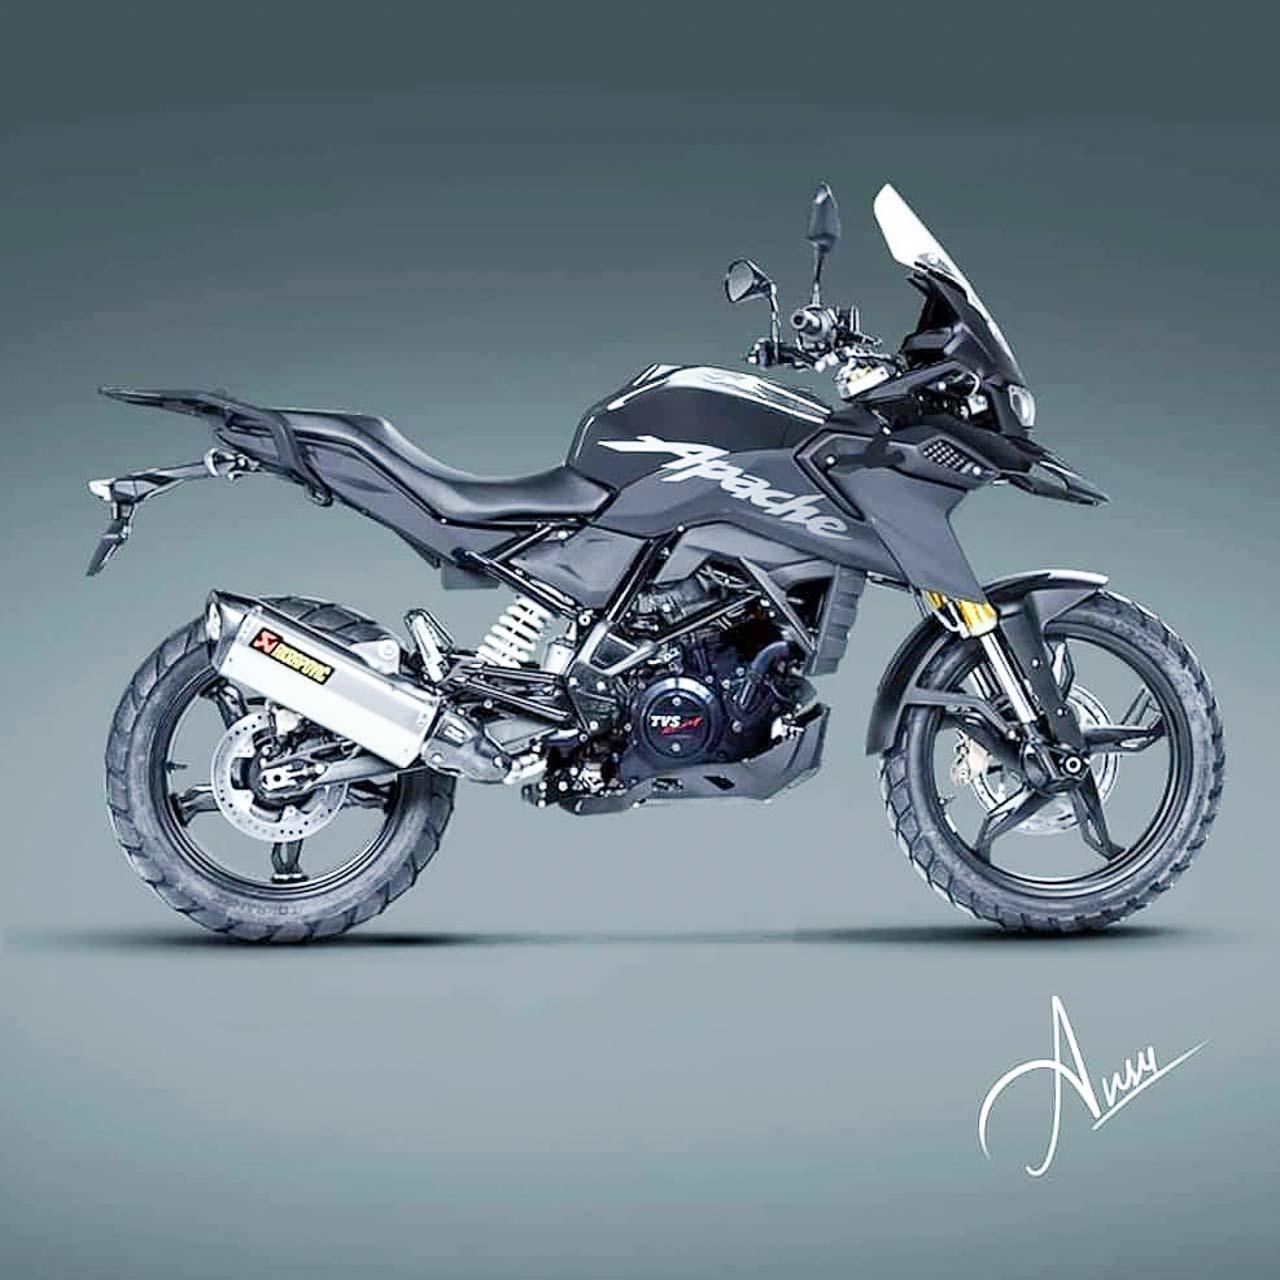 TVS Apache 310 Adventure Render – KTM 390 ADV, Himalayan Rival